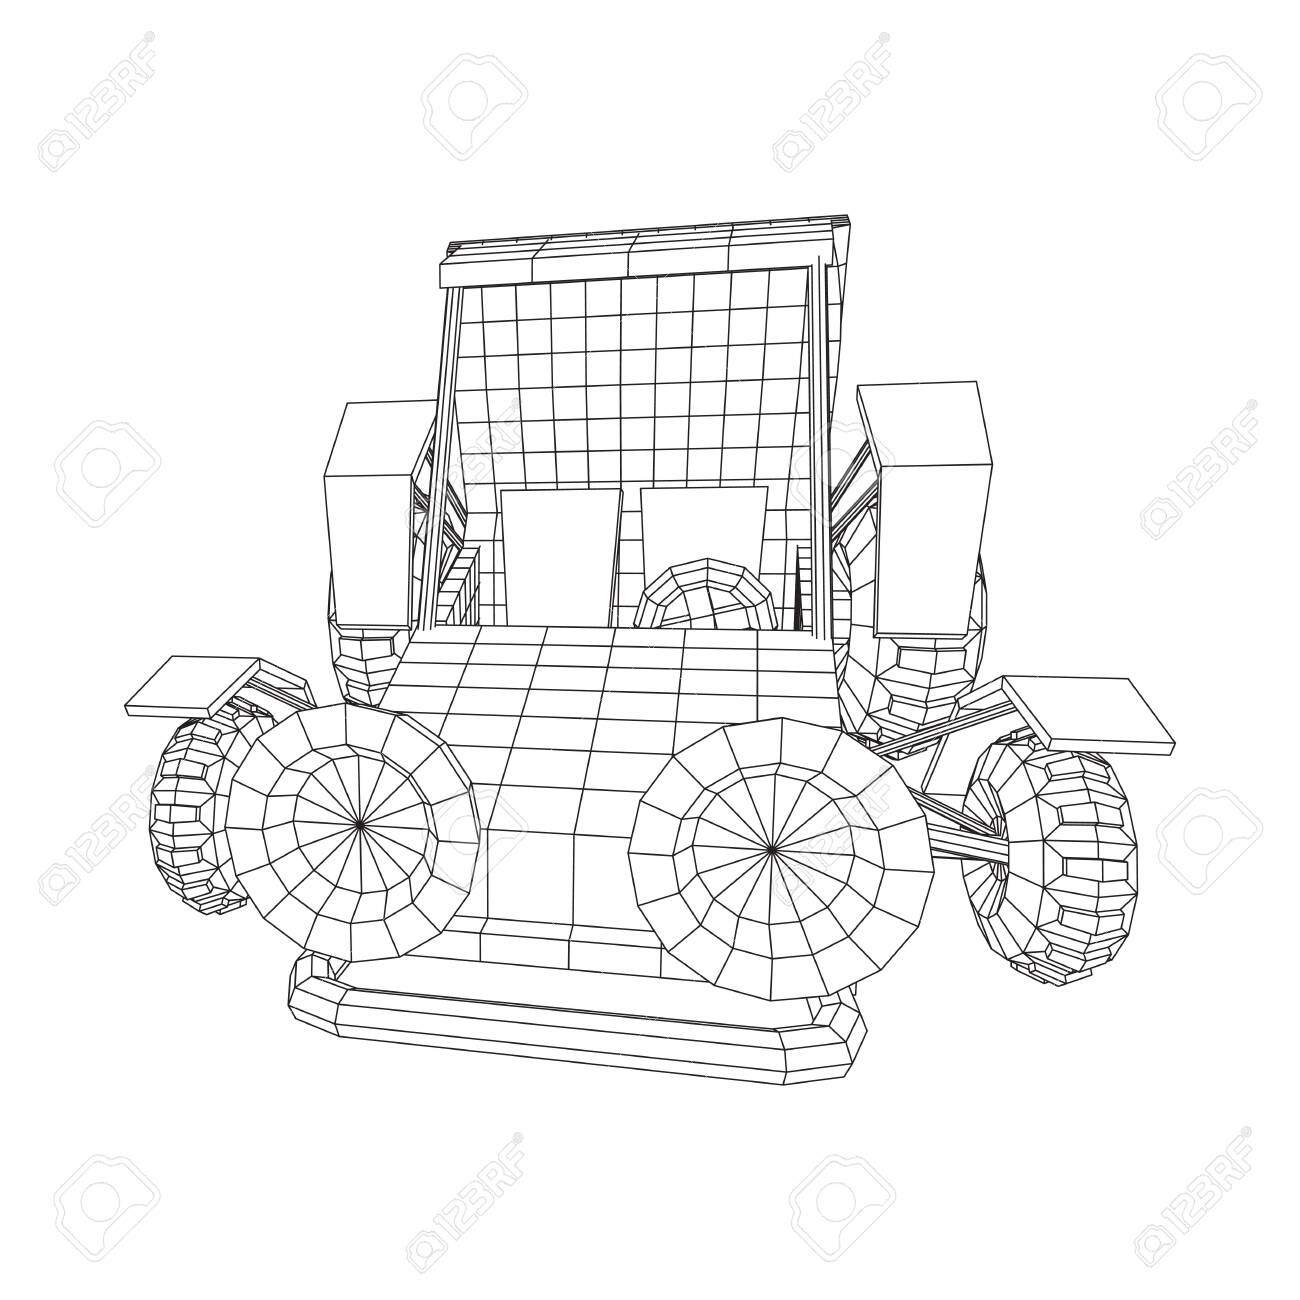 Off road dune buggy car  Terrain vehicle  Outdoor car racing,